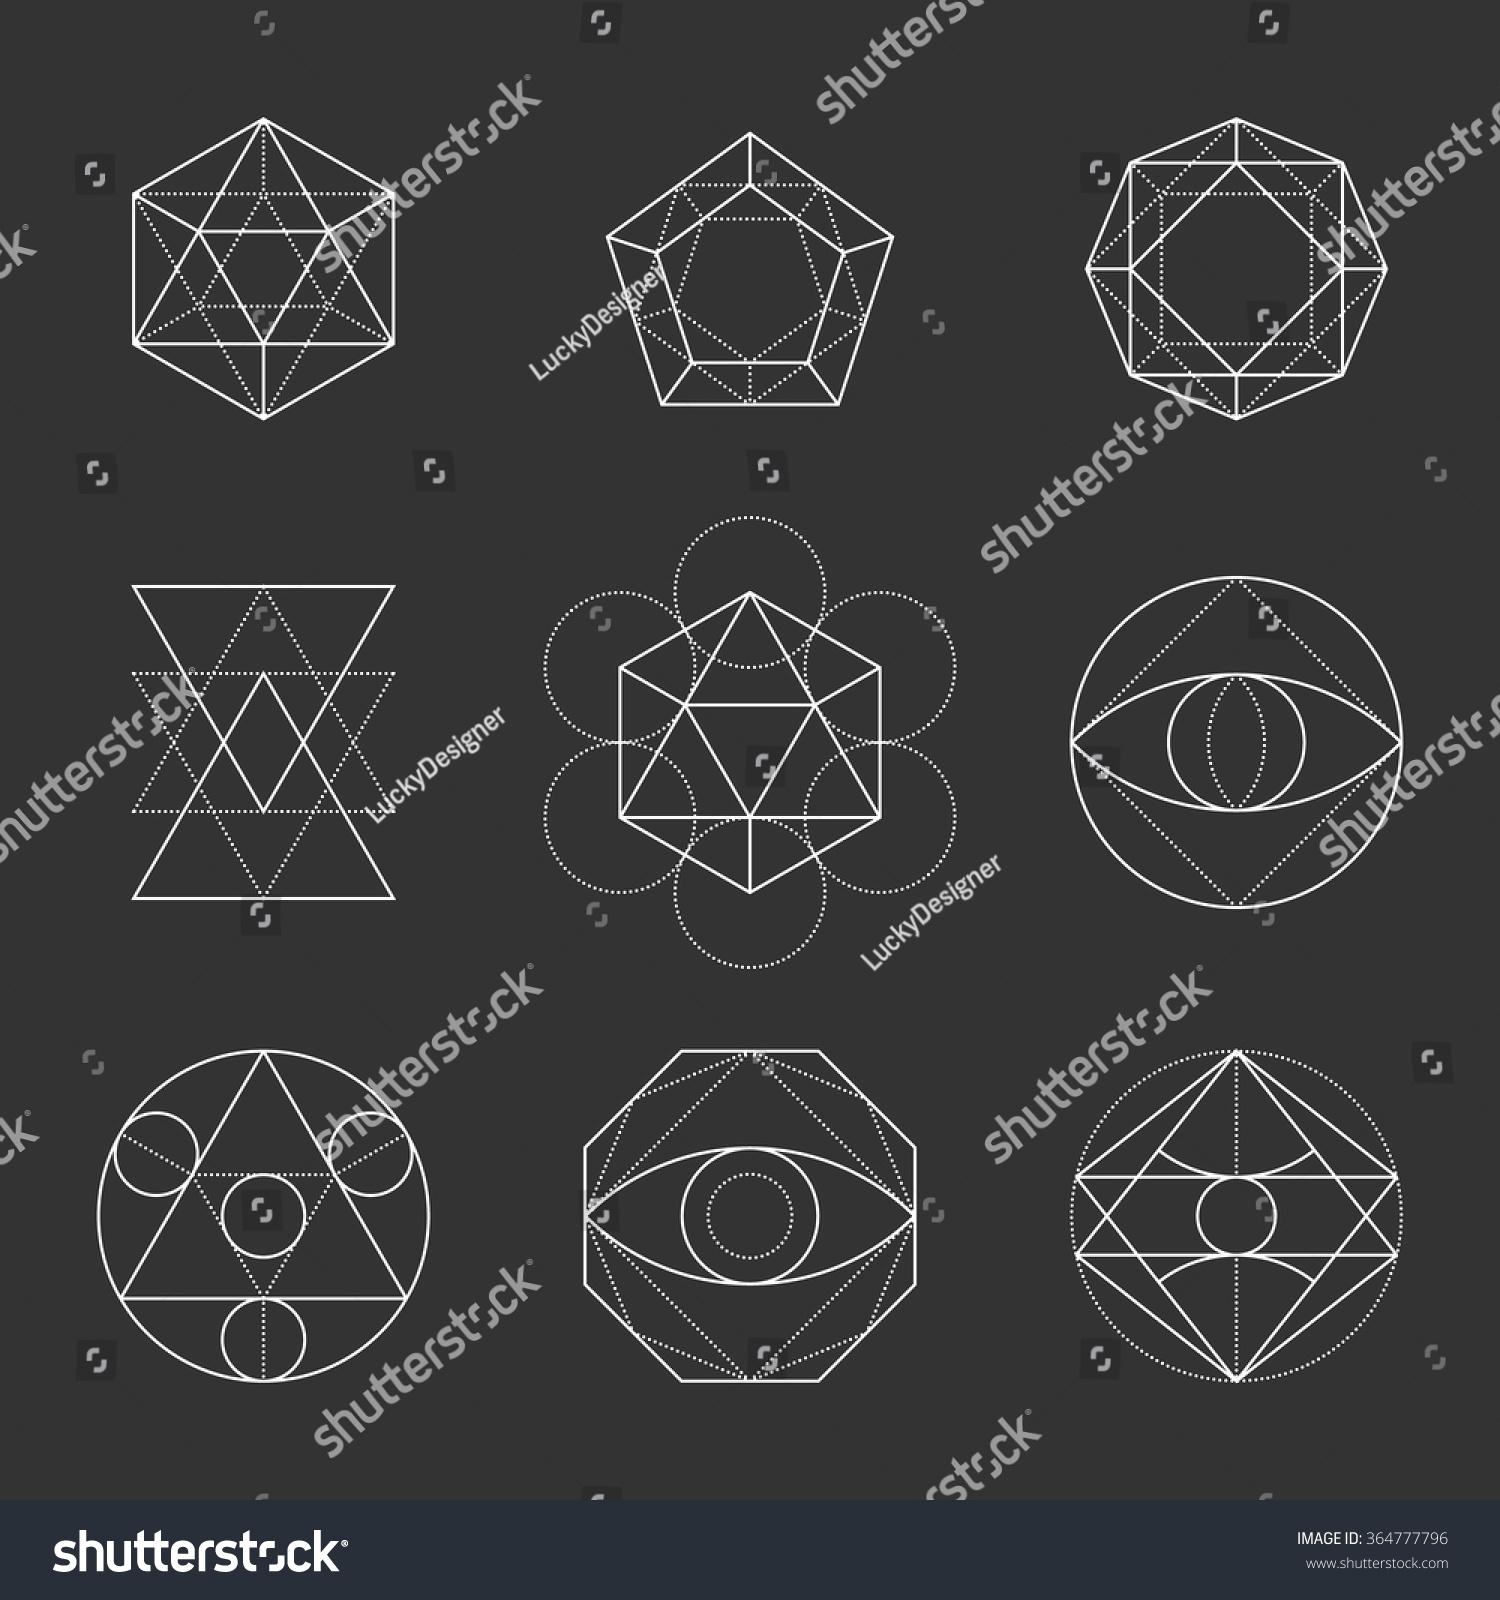 Sacred Geometry Shapes Spirituality Alchemy Religion 364777796 on Geometri Shapes English